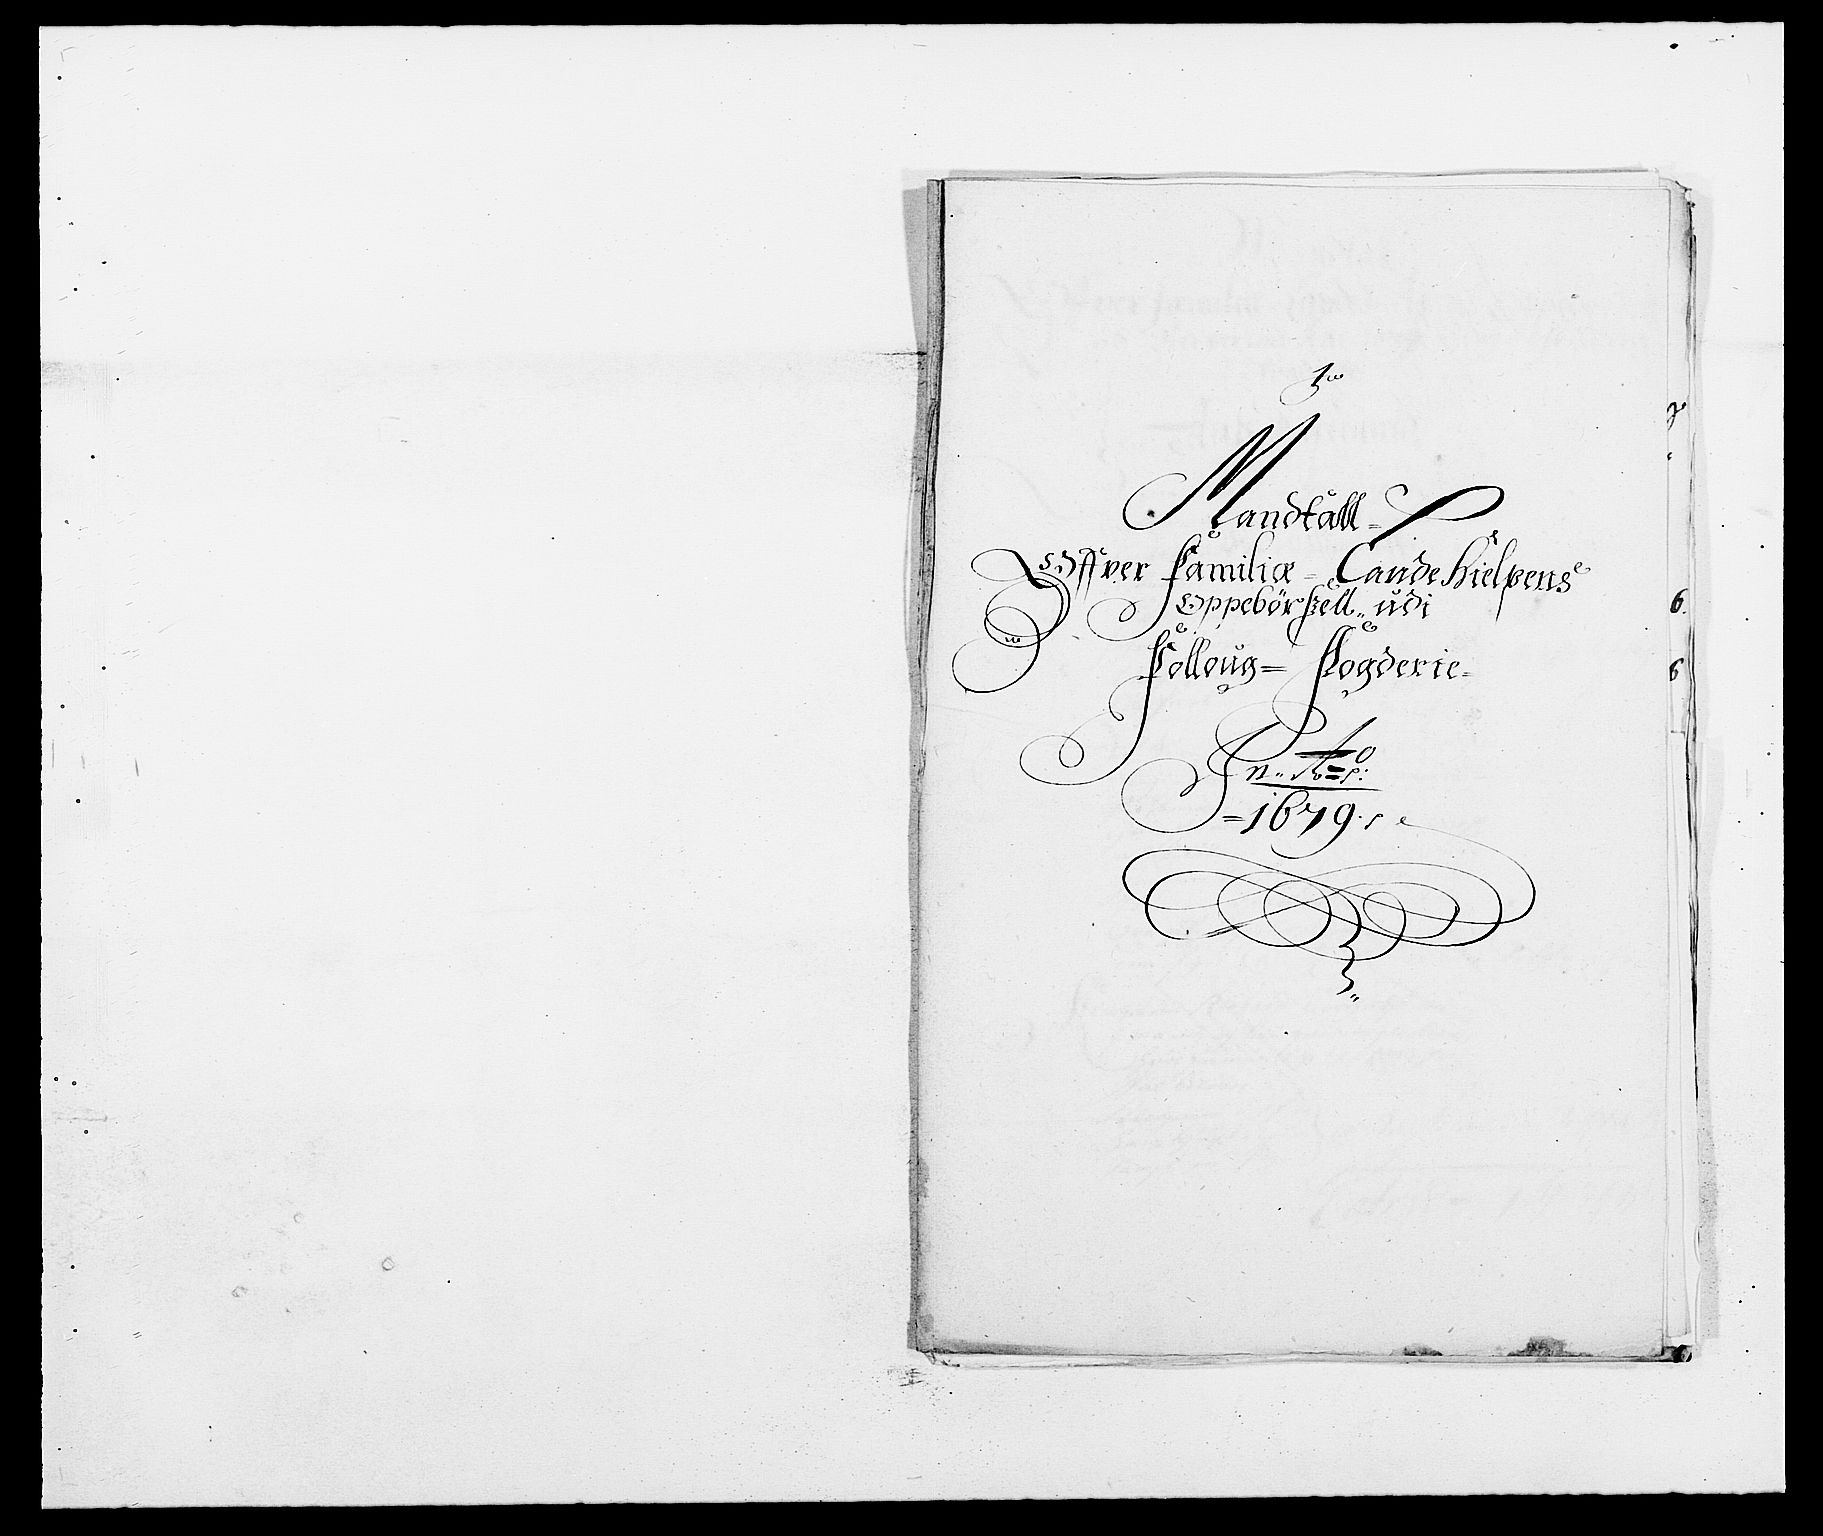 RA, Rentekammeret inntil 1814, Reviderte regnskaper, Fogderegnskap, R09/L0428: Fogderegnskap Follo, 1679, s. 243